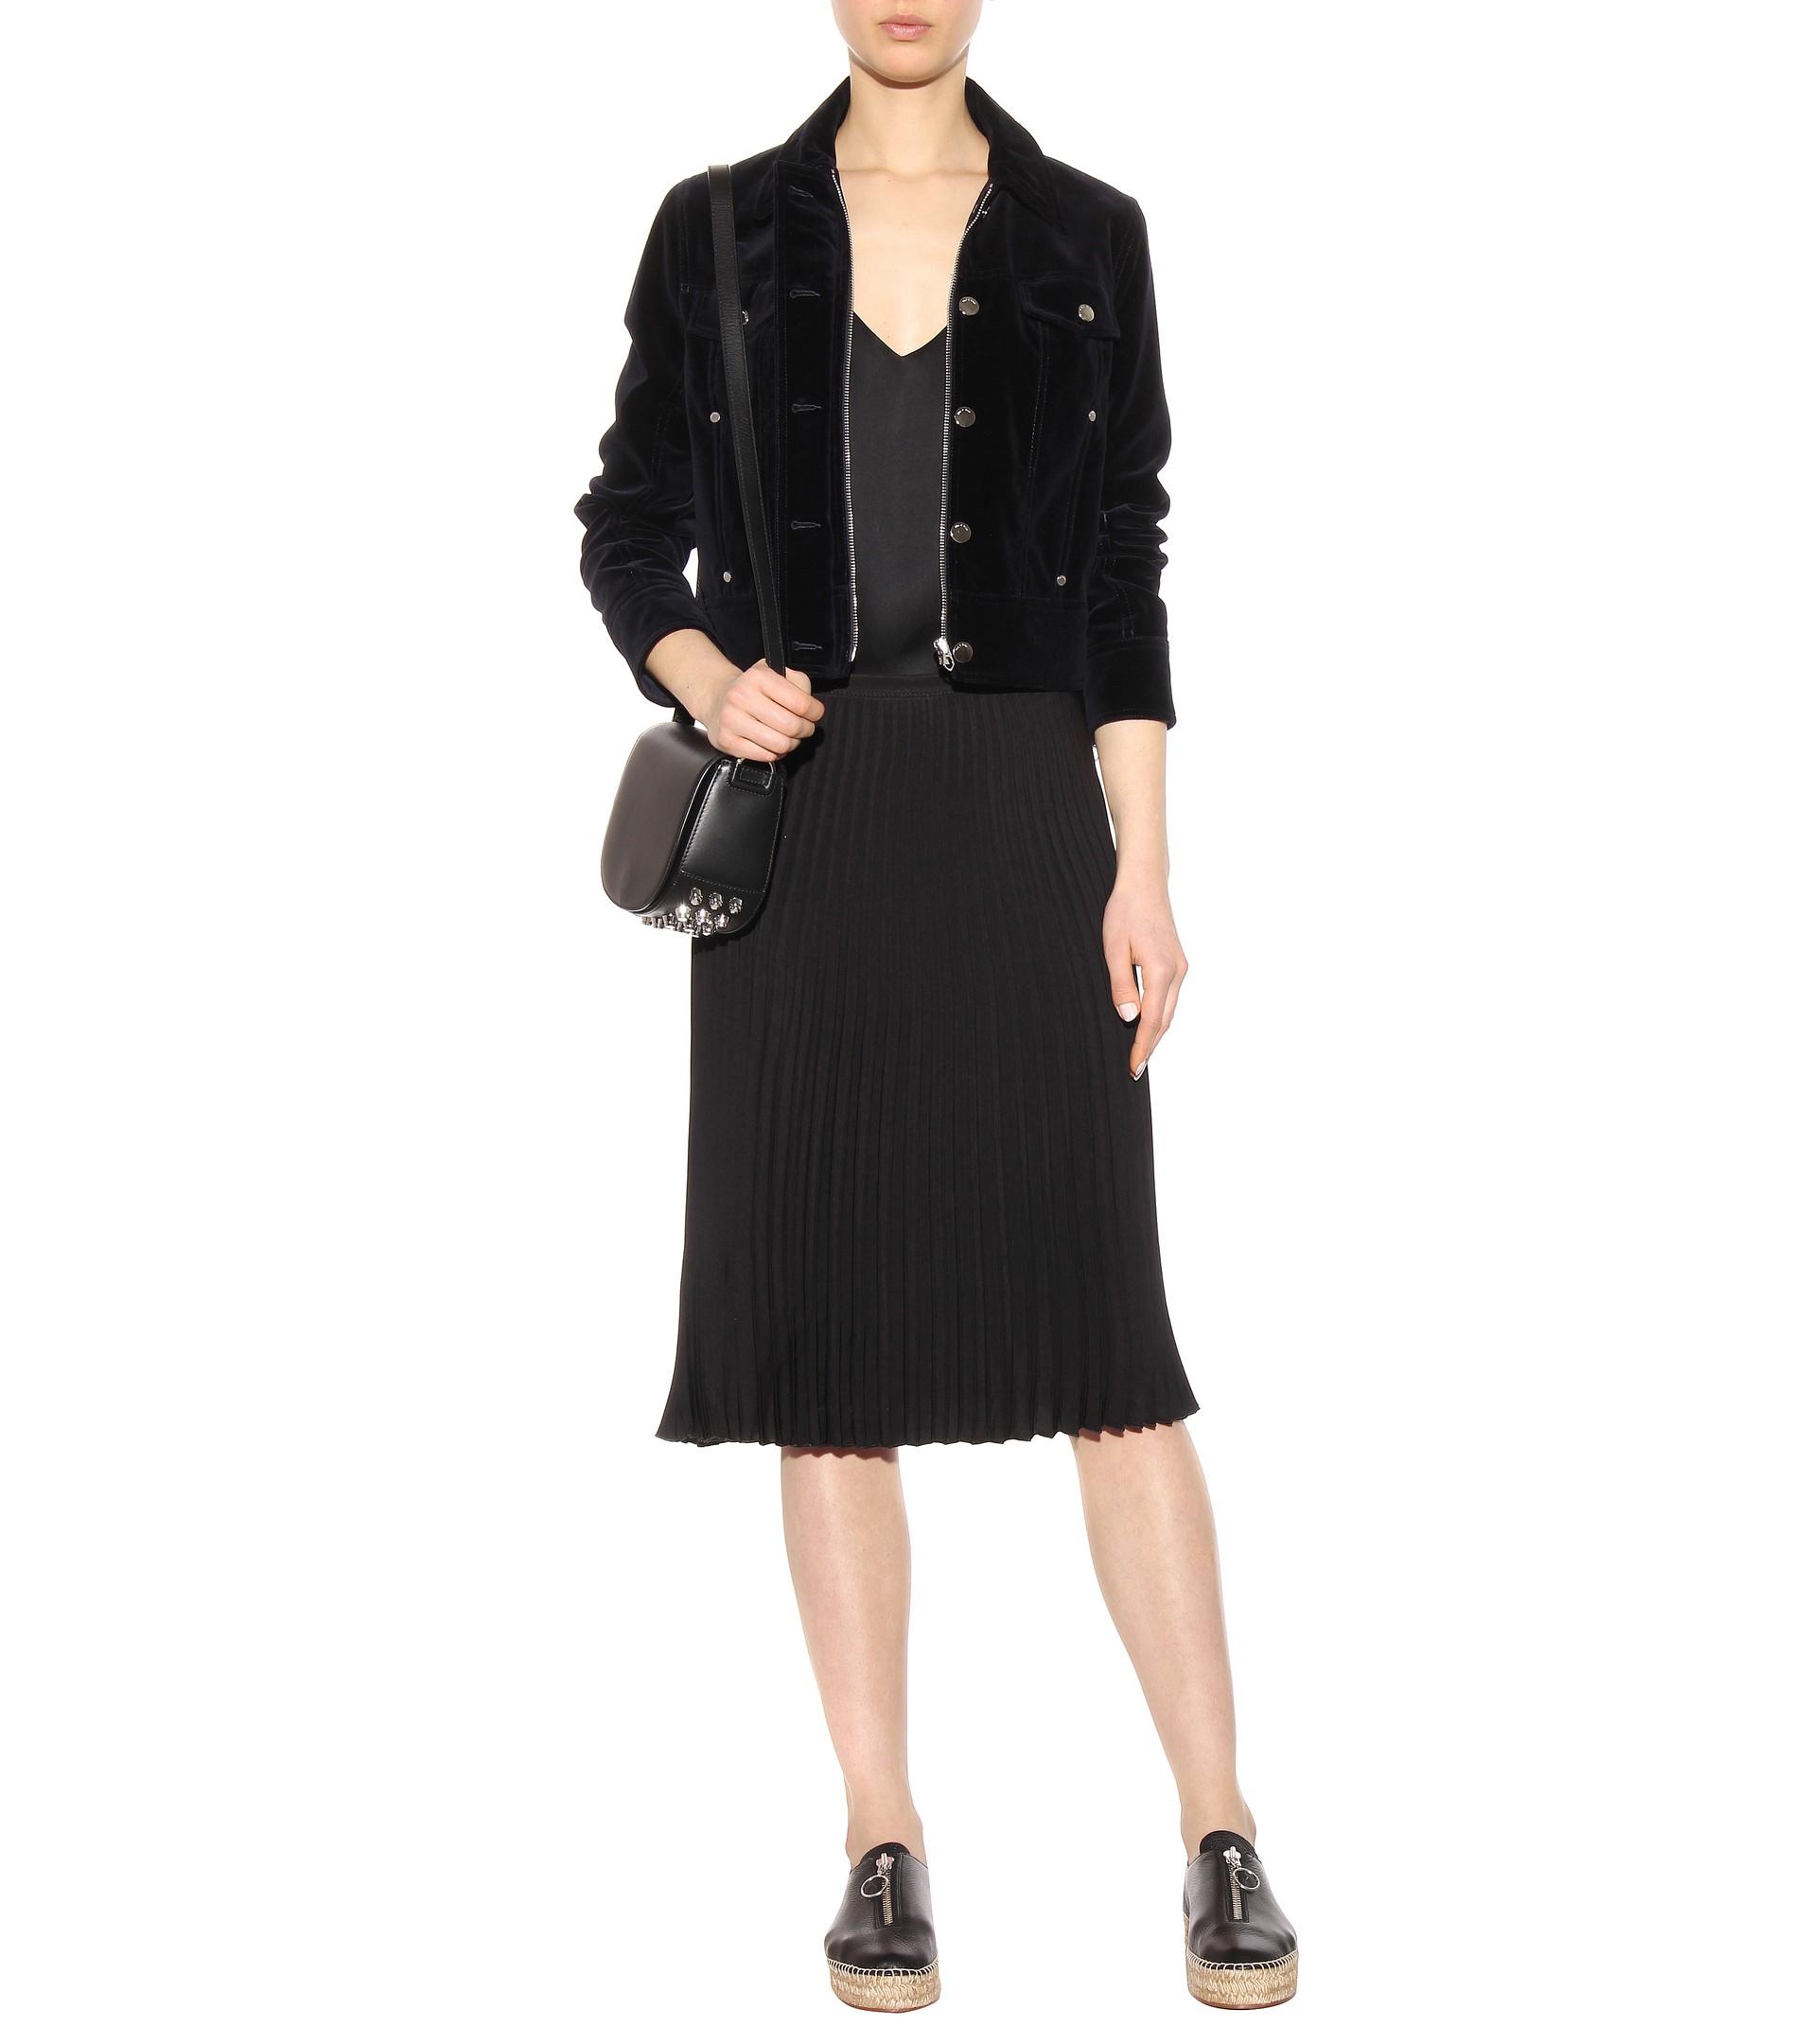 Alexander Wang Devon Leather Espadrilles really for sale largest supplier cheap online professional 100% original online top quality sale online dMpV3Kg6